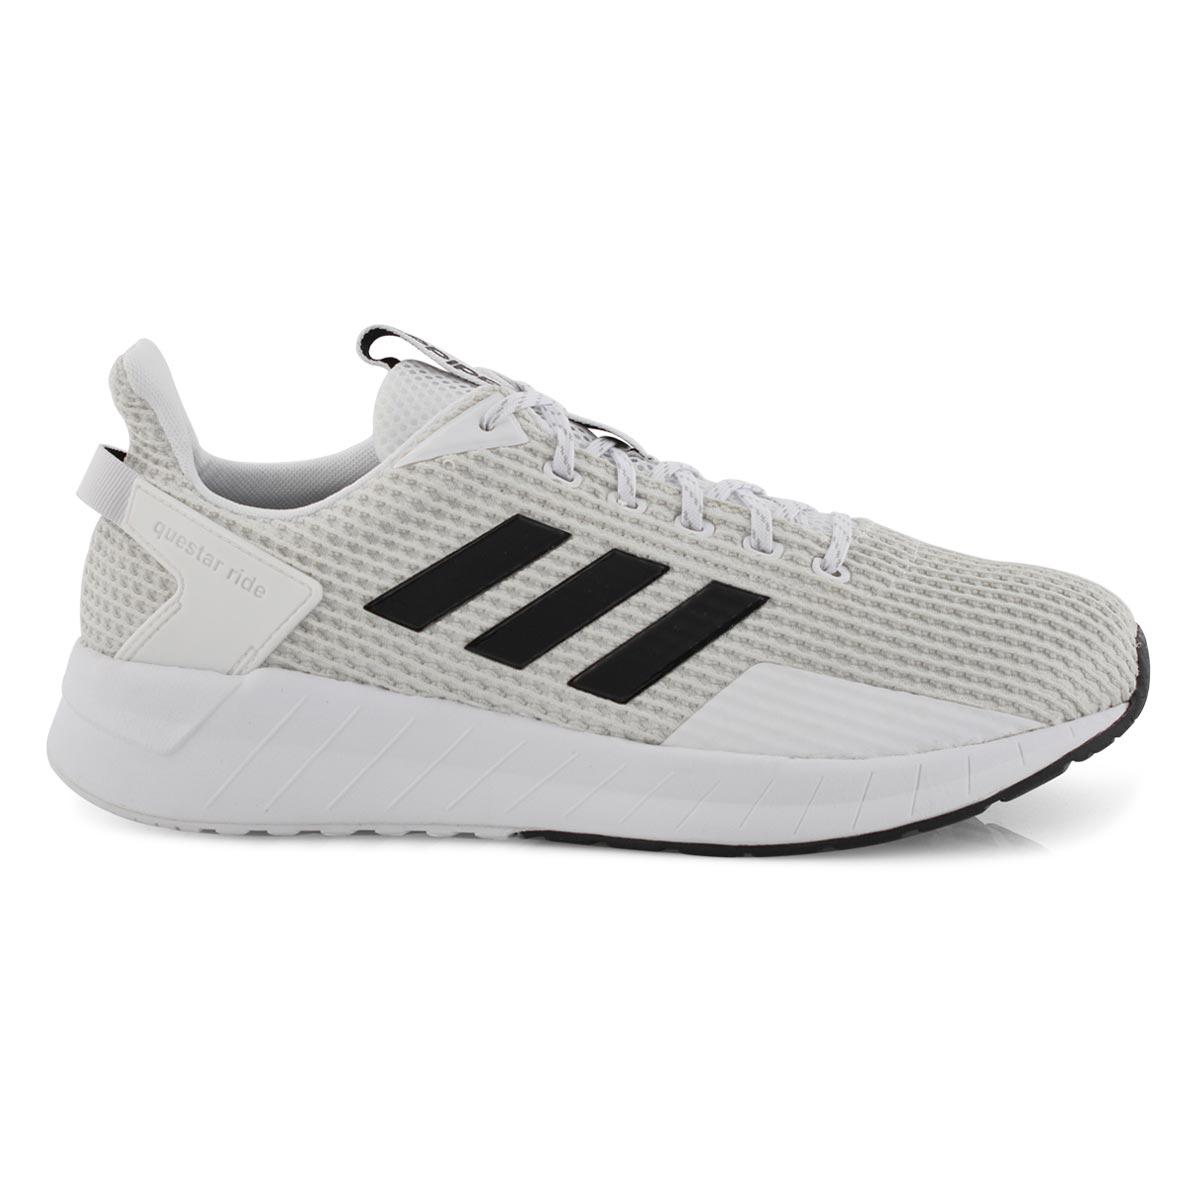 Mns Questar Ride wht/blk running shoe